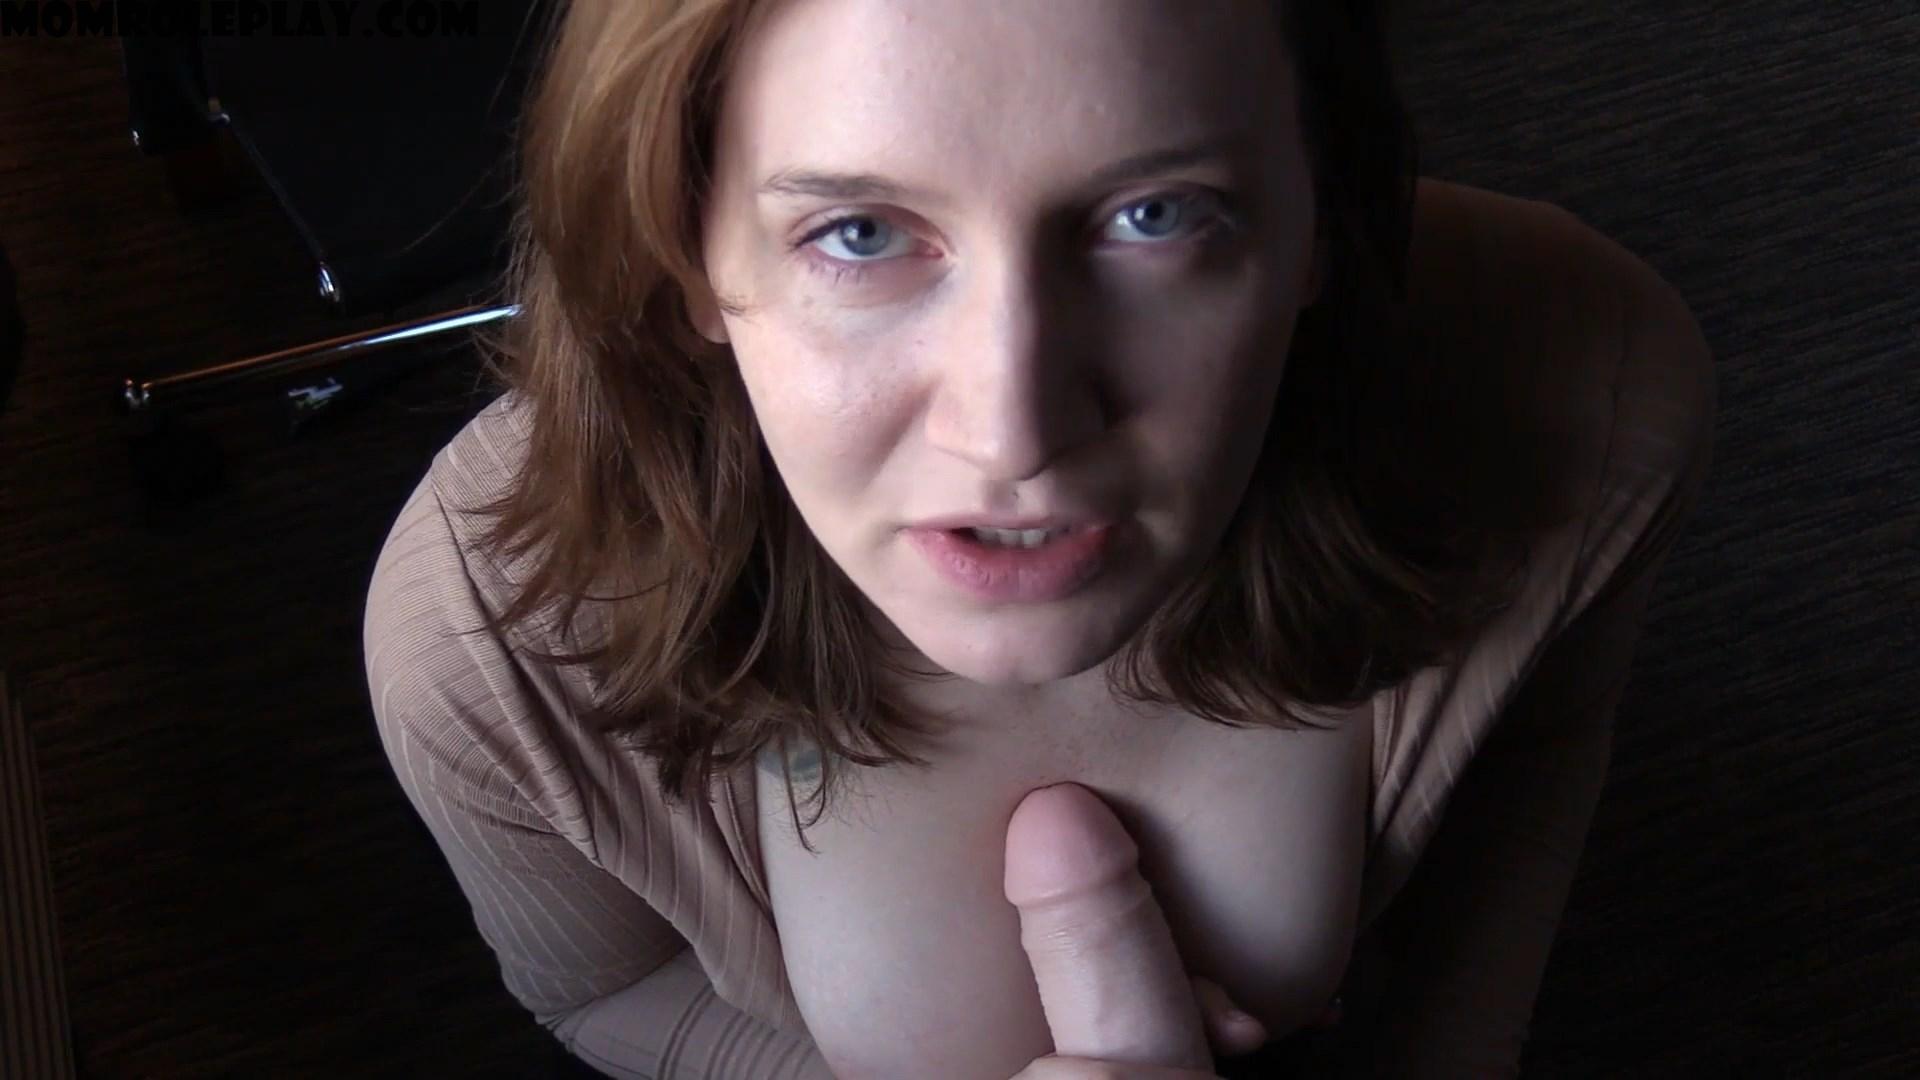 Bettie Bondage - Mom is a Sex Addict mp4